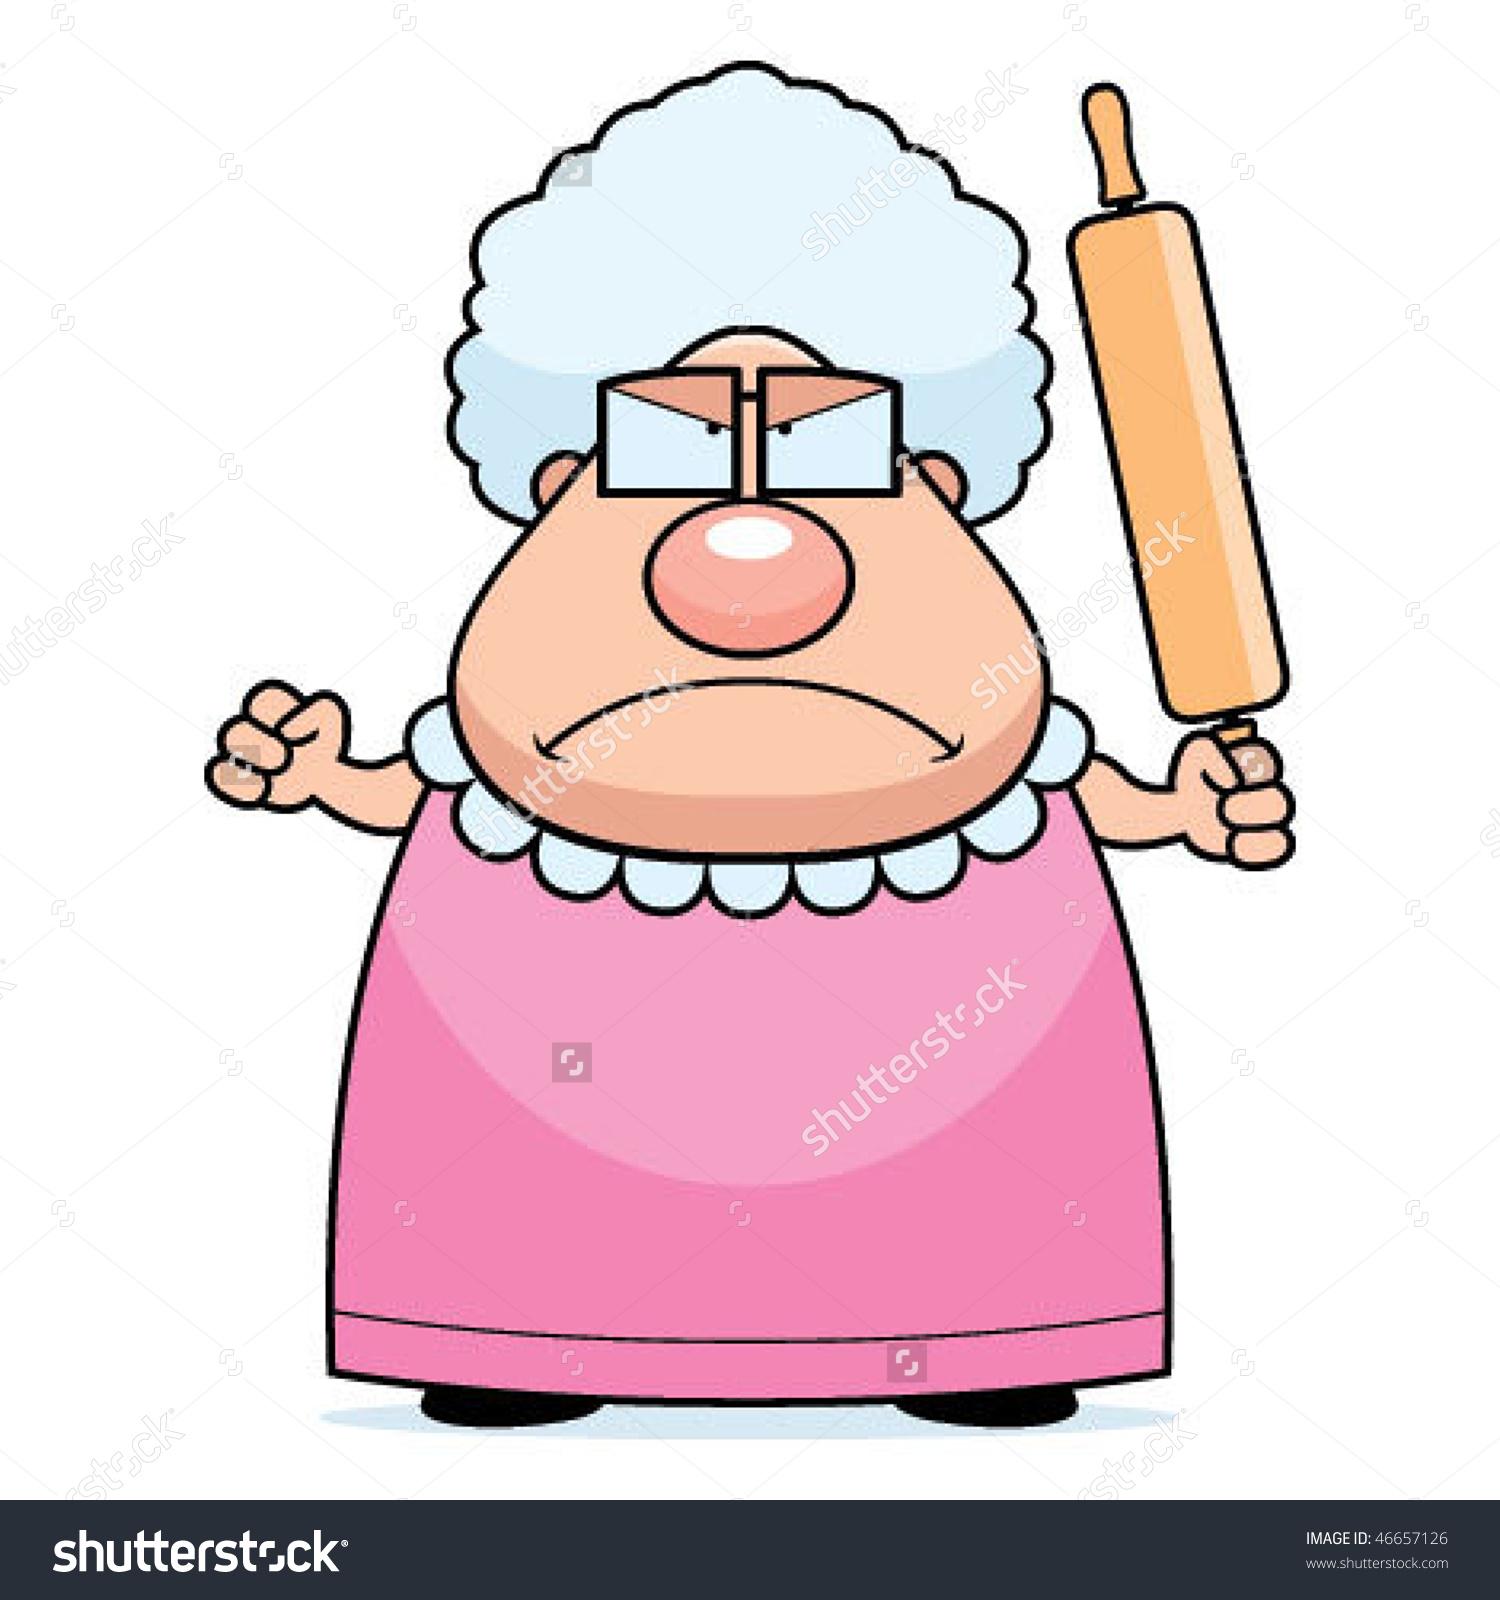 1500x1600 Angry Grandma Clipart Amp Angry Grandma Clip Art Images